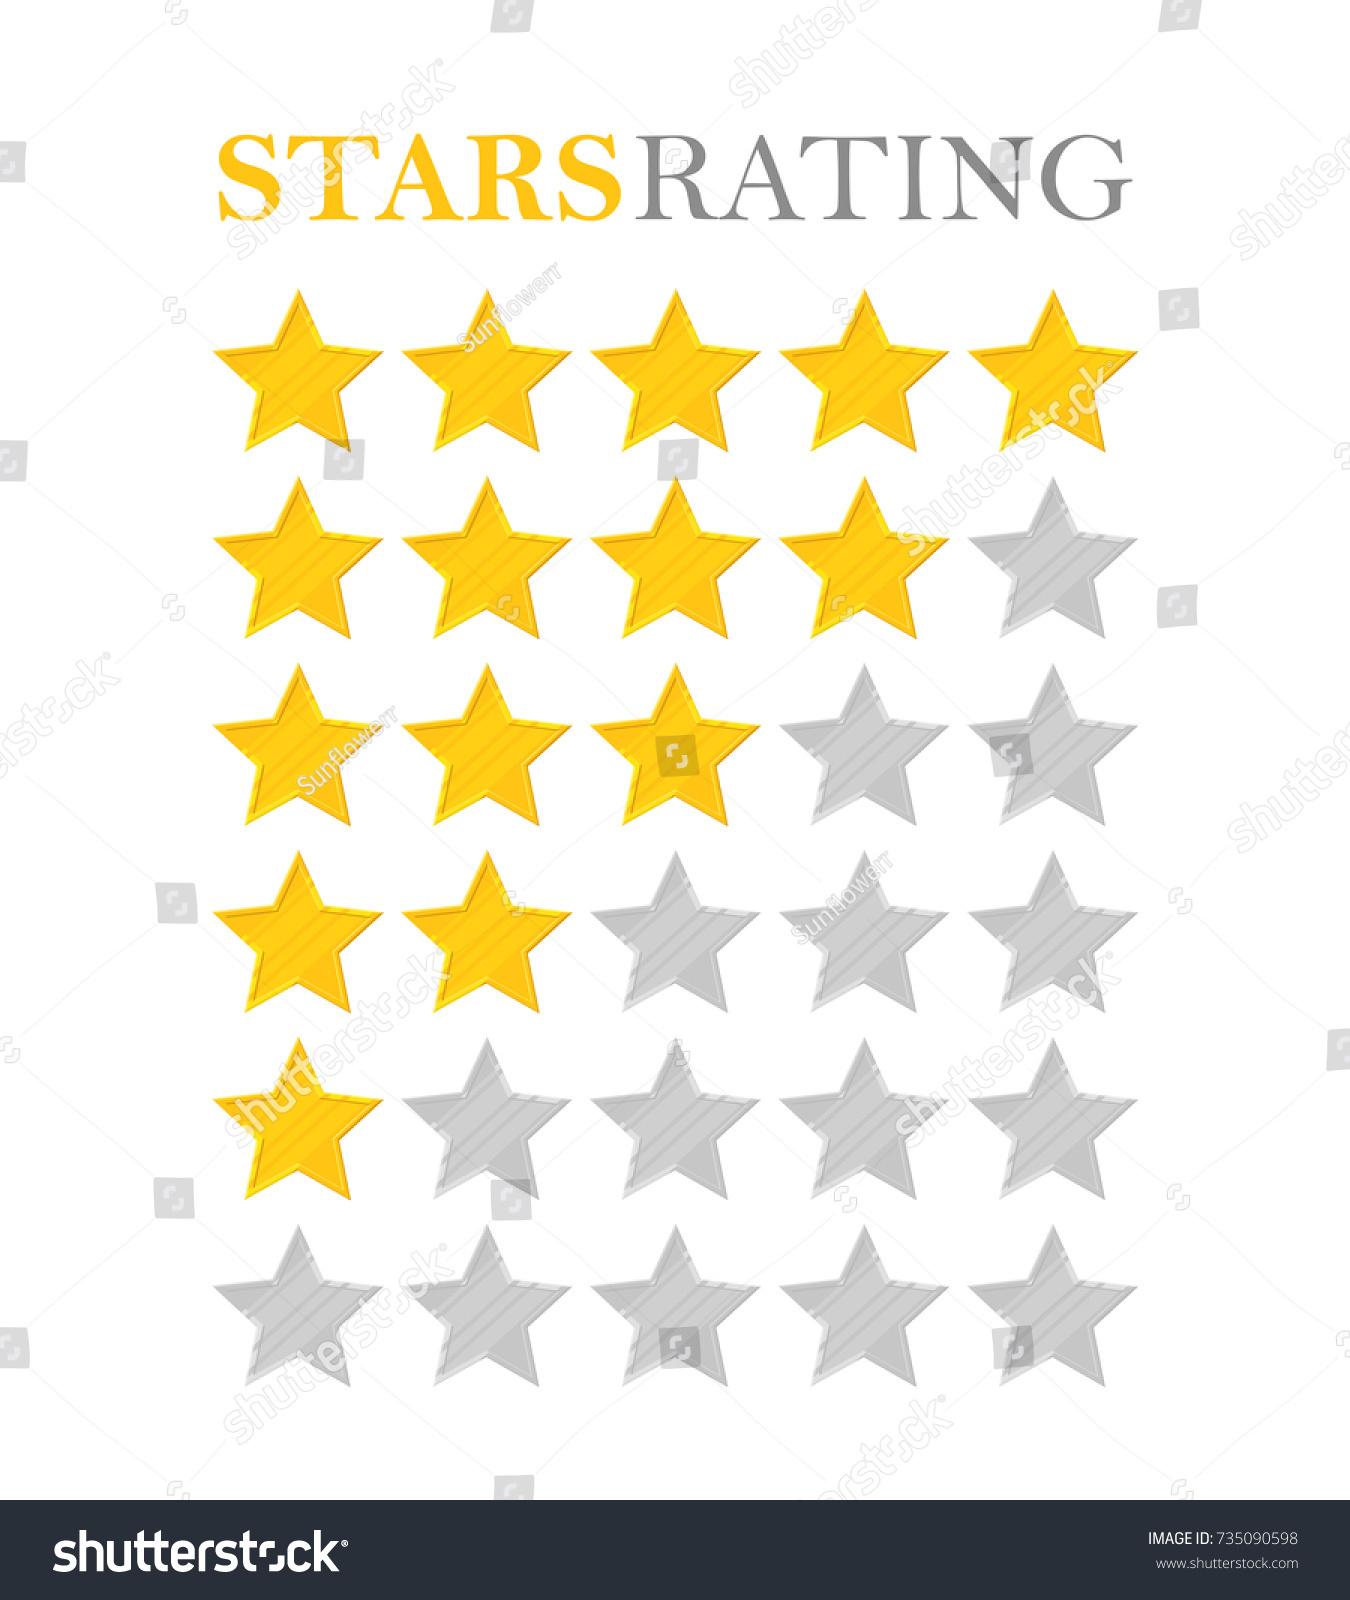 Golden star rating five stars symbol stock vector 735090598 golden star rating five stars symbol of best quality high service victories biocorpaavc